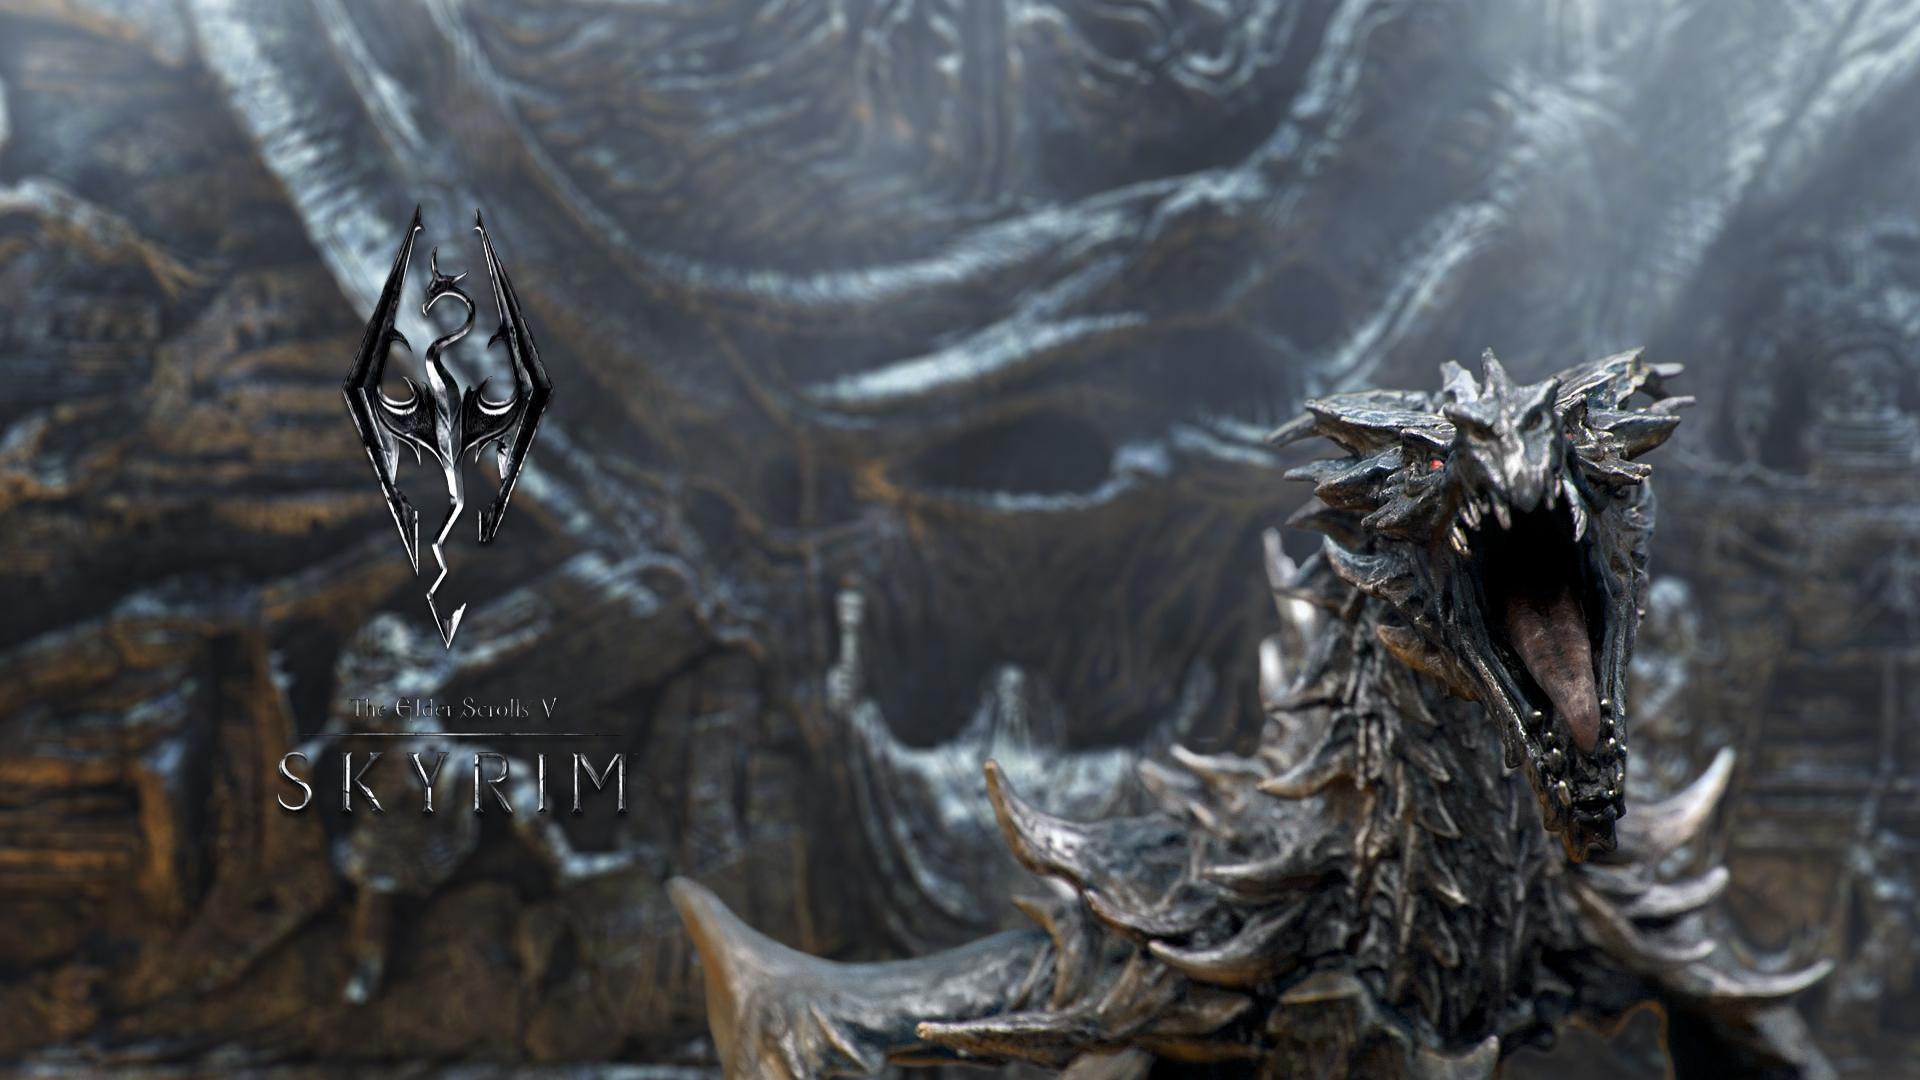 Dragon Hd Wallpapers 1080p: Dragon HD Wallpapers 1080p